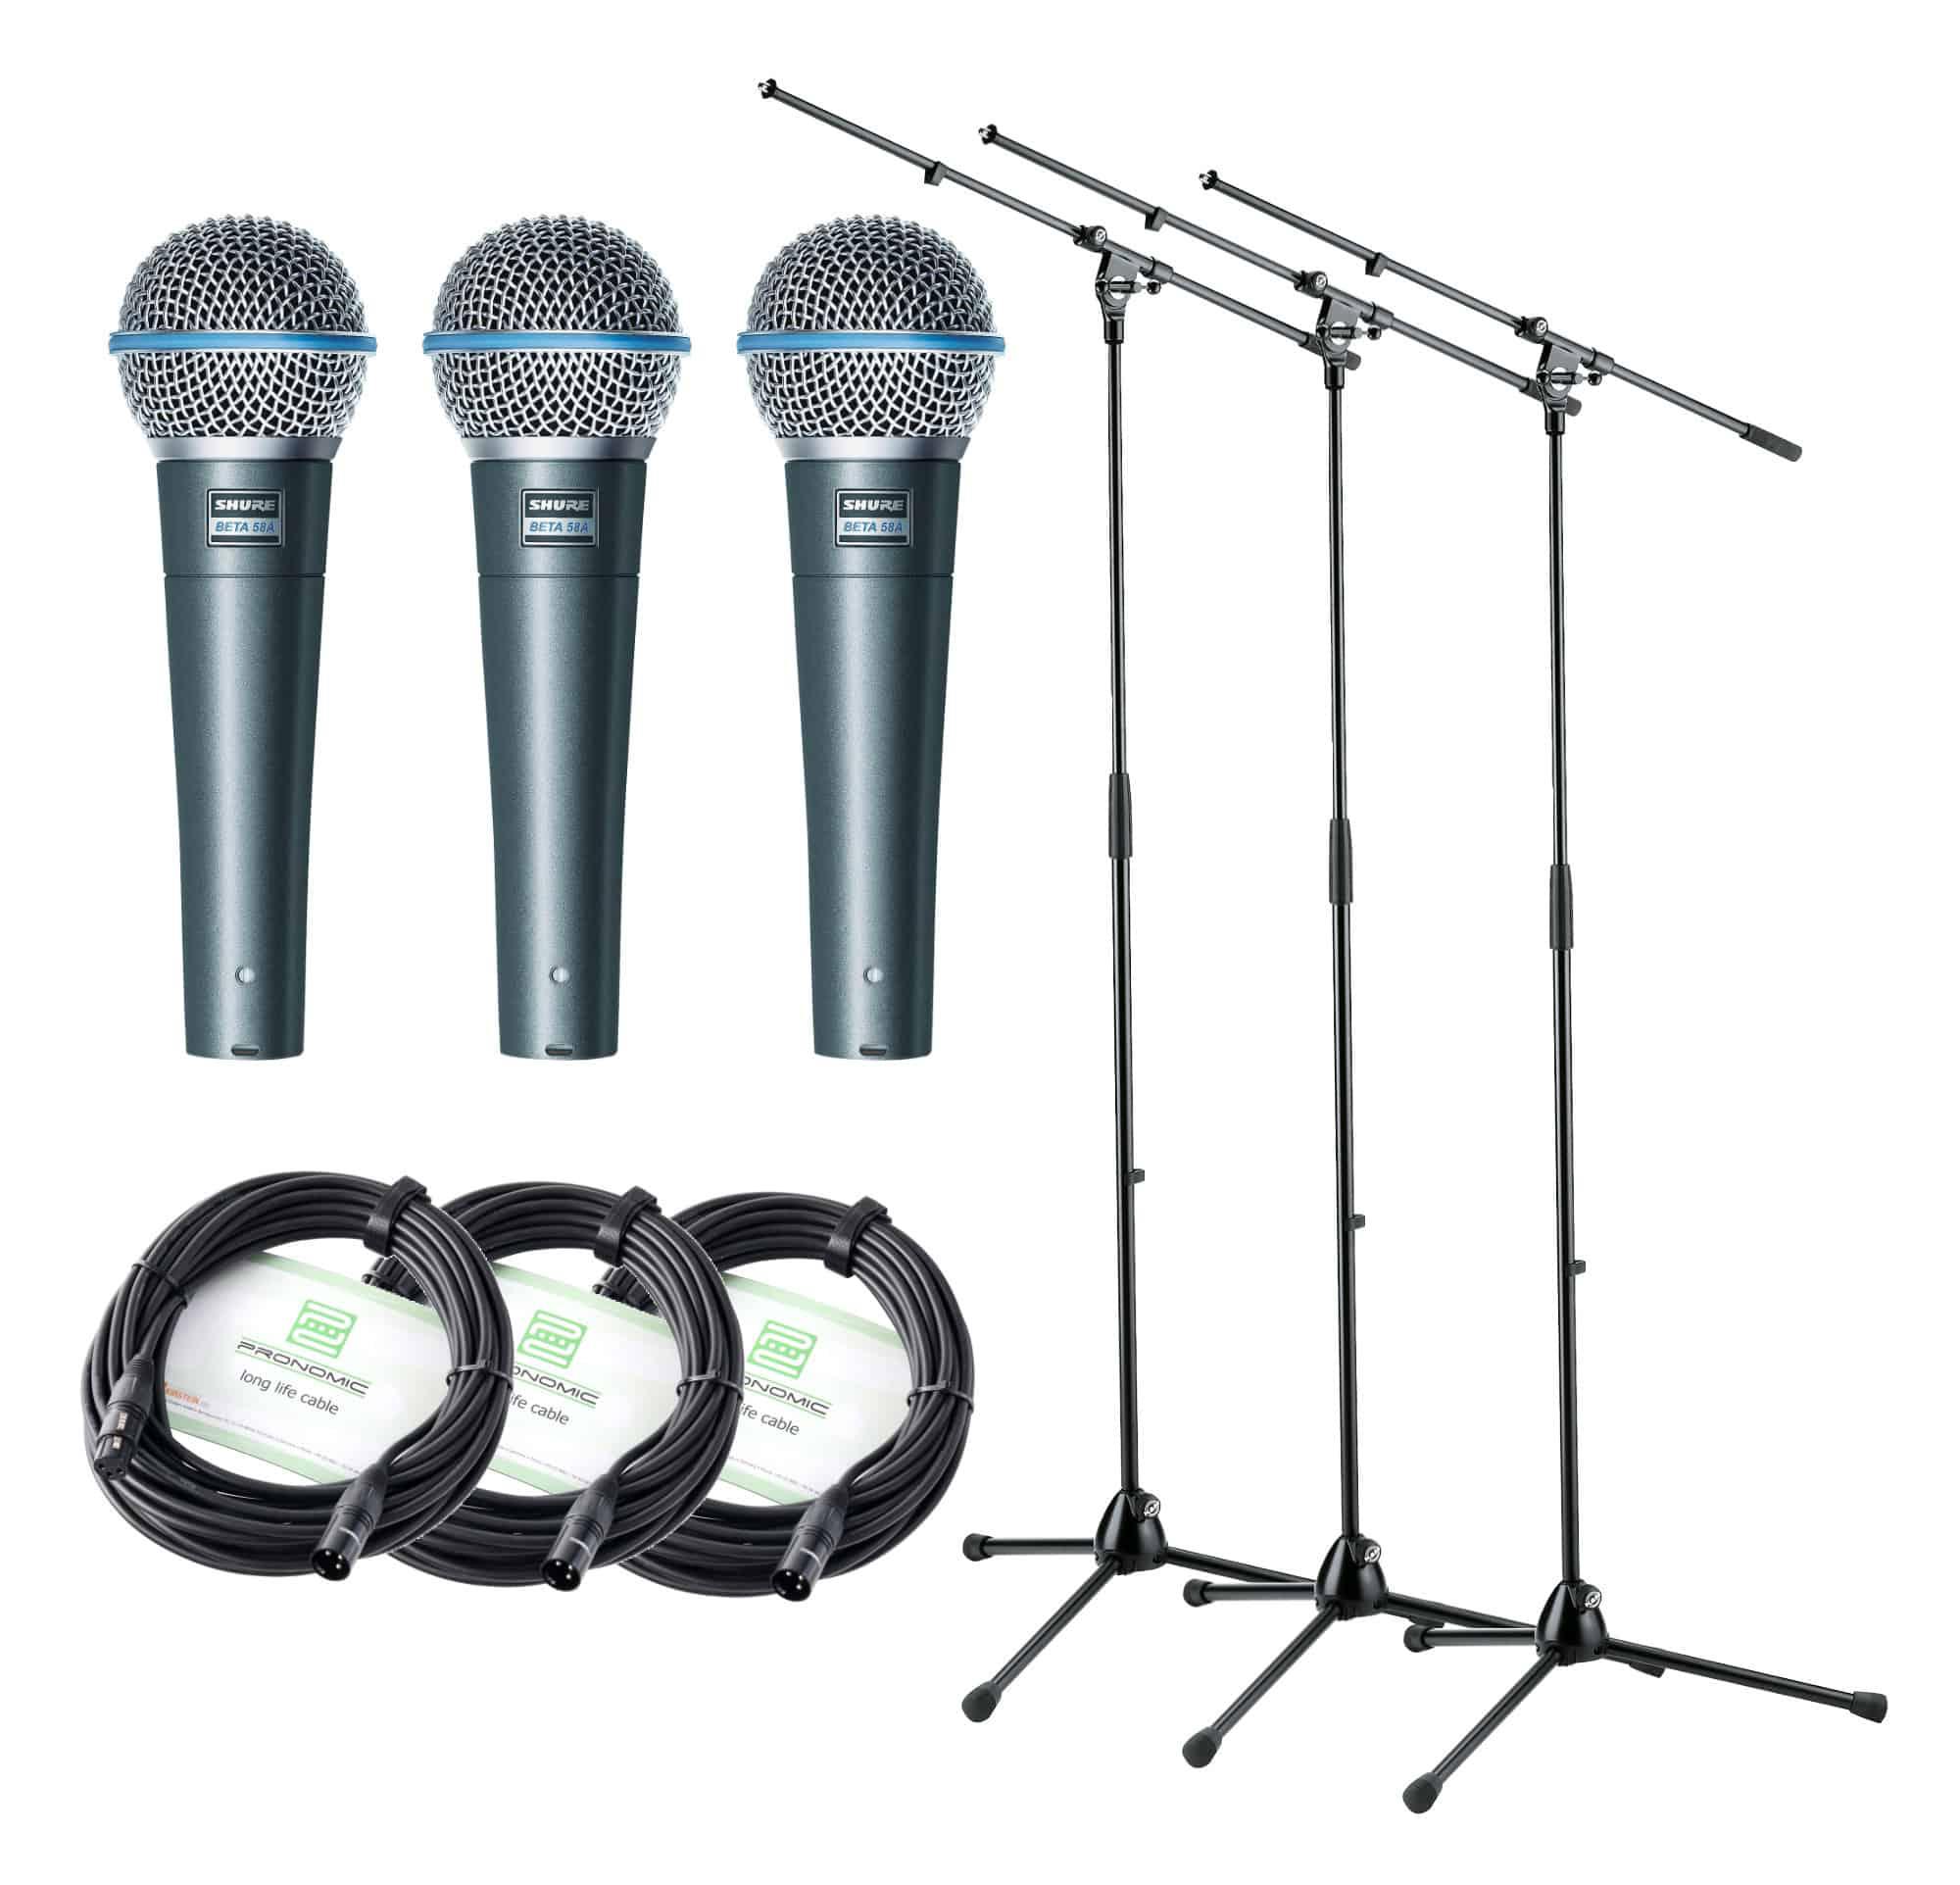 Shure Beta 58A Mikrofon 3x3 Set Ständer Kabel 3 Mikrofone